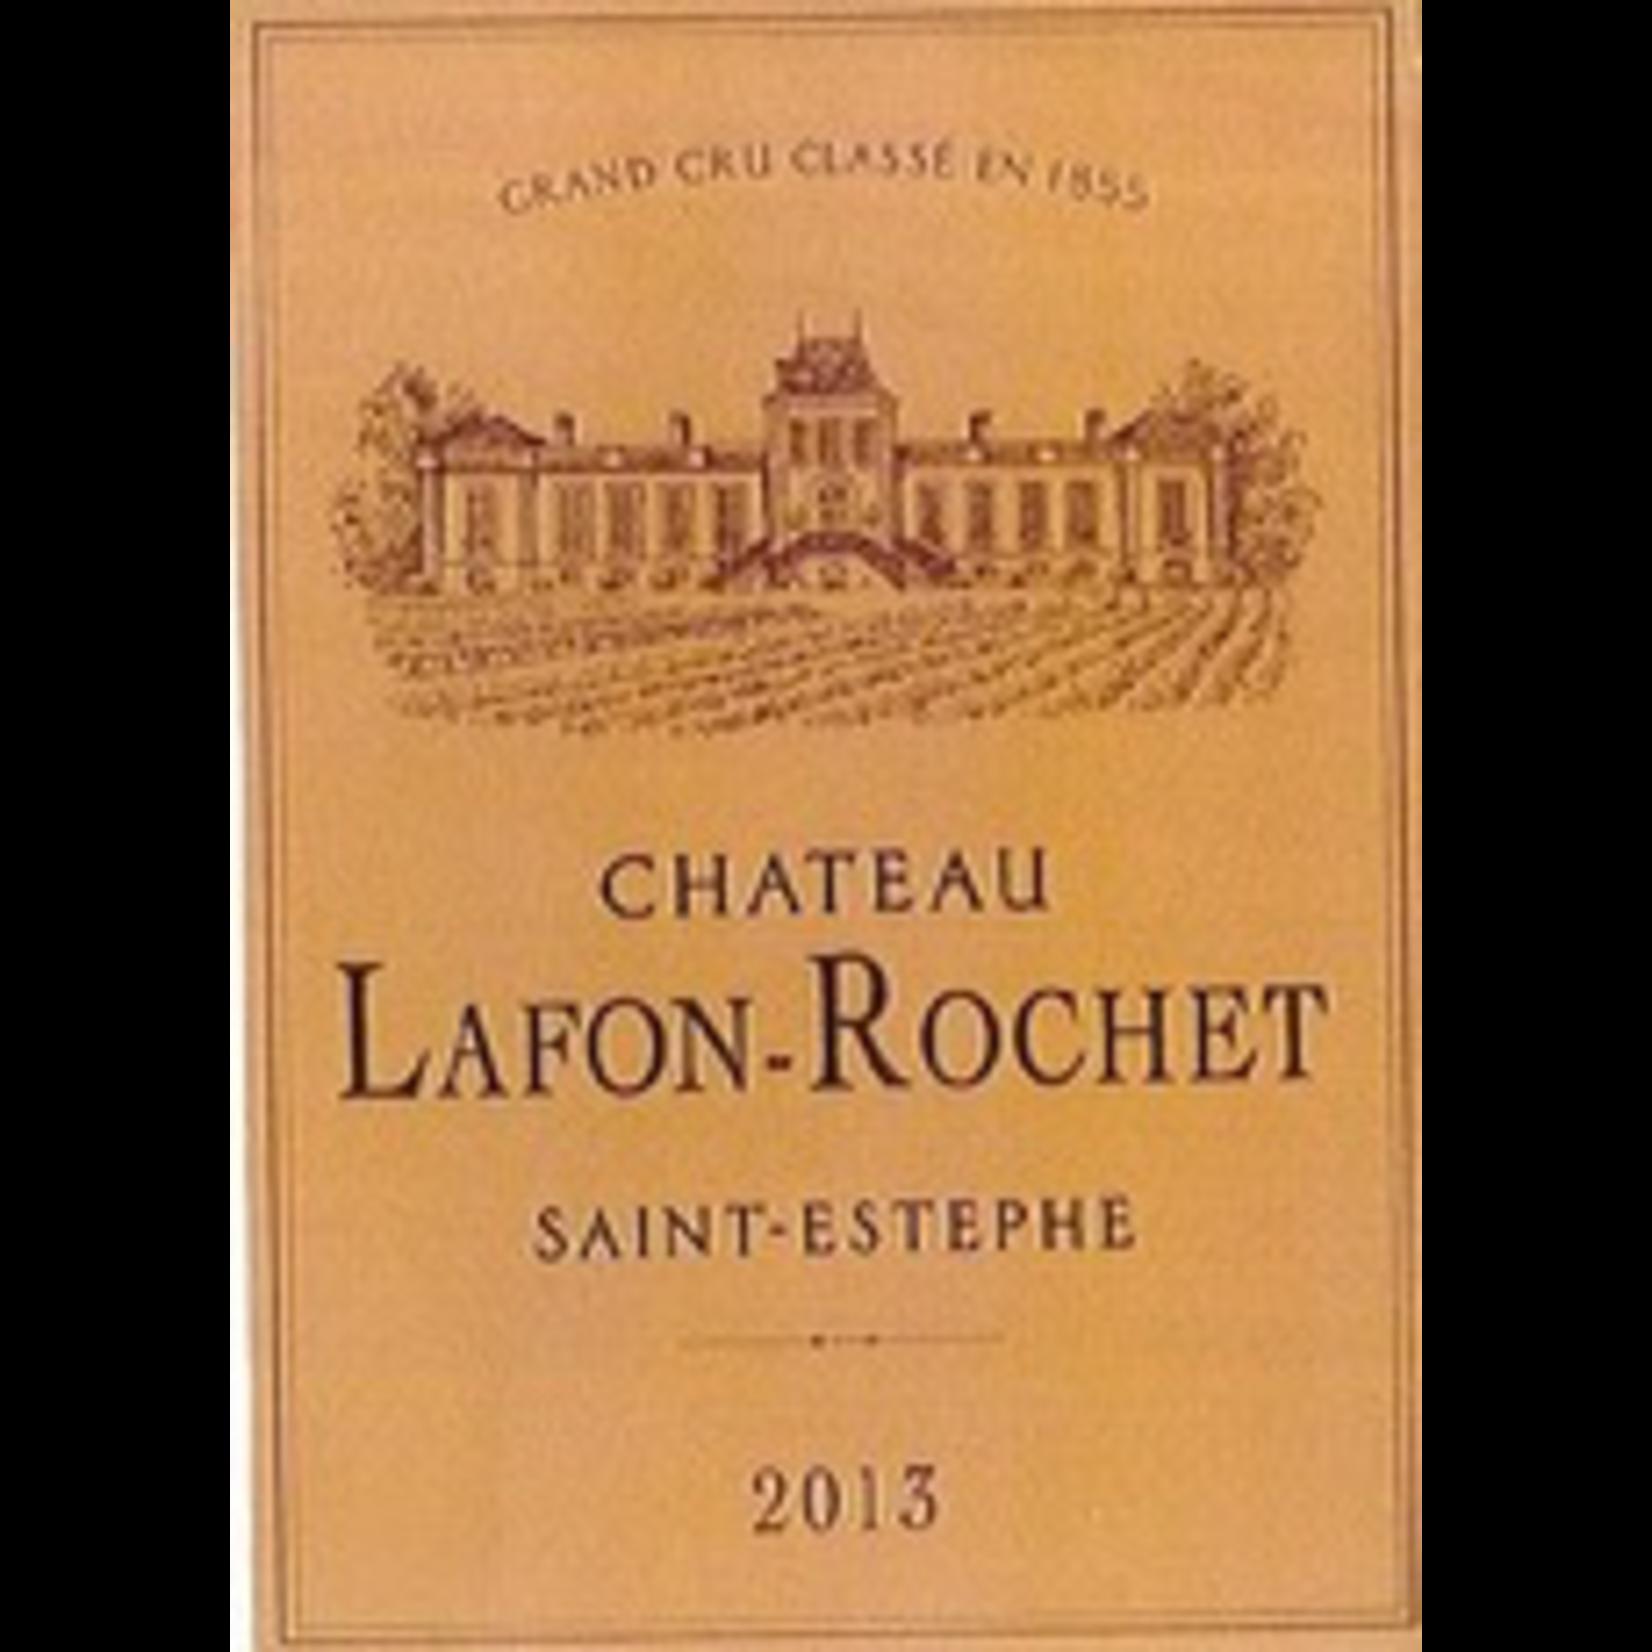 Chateau Lafon-Rochet 2013